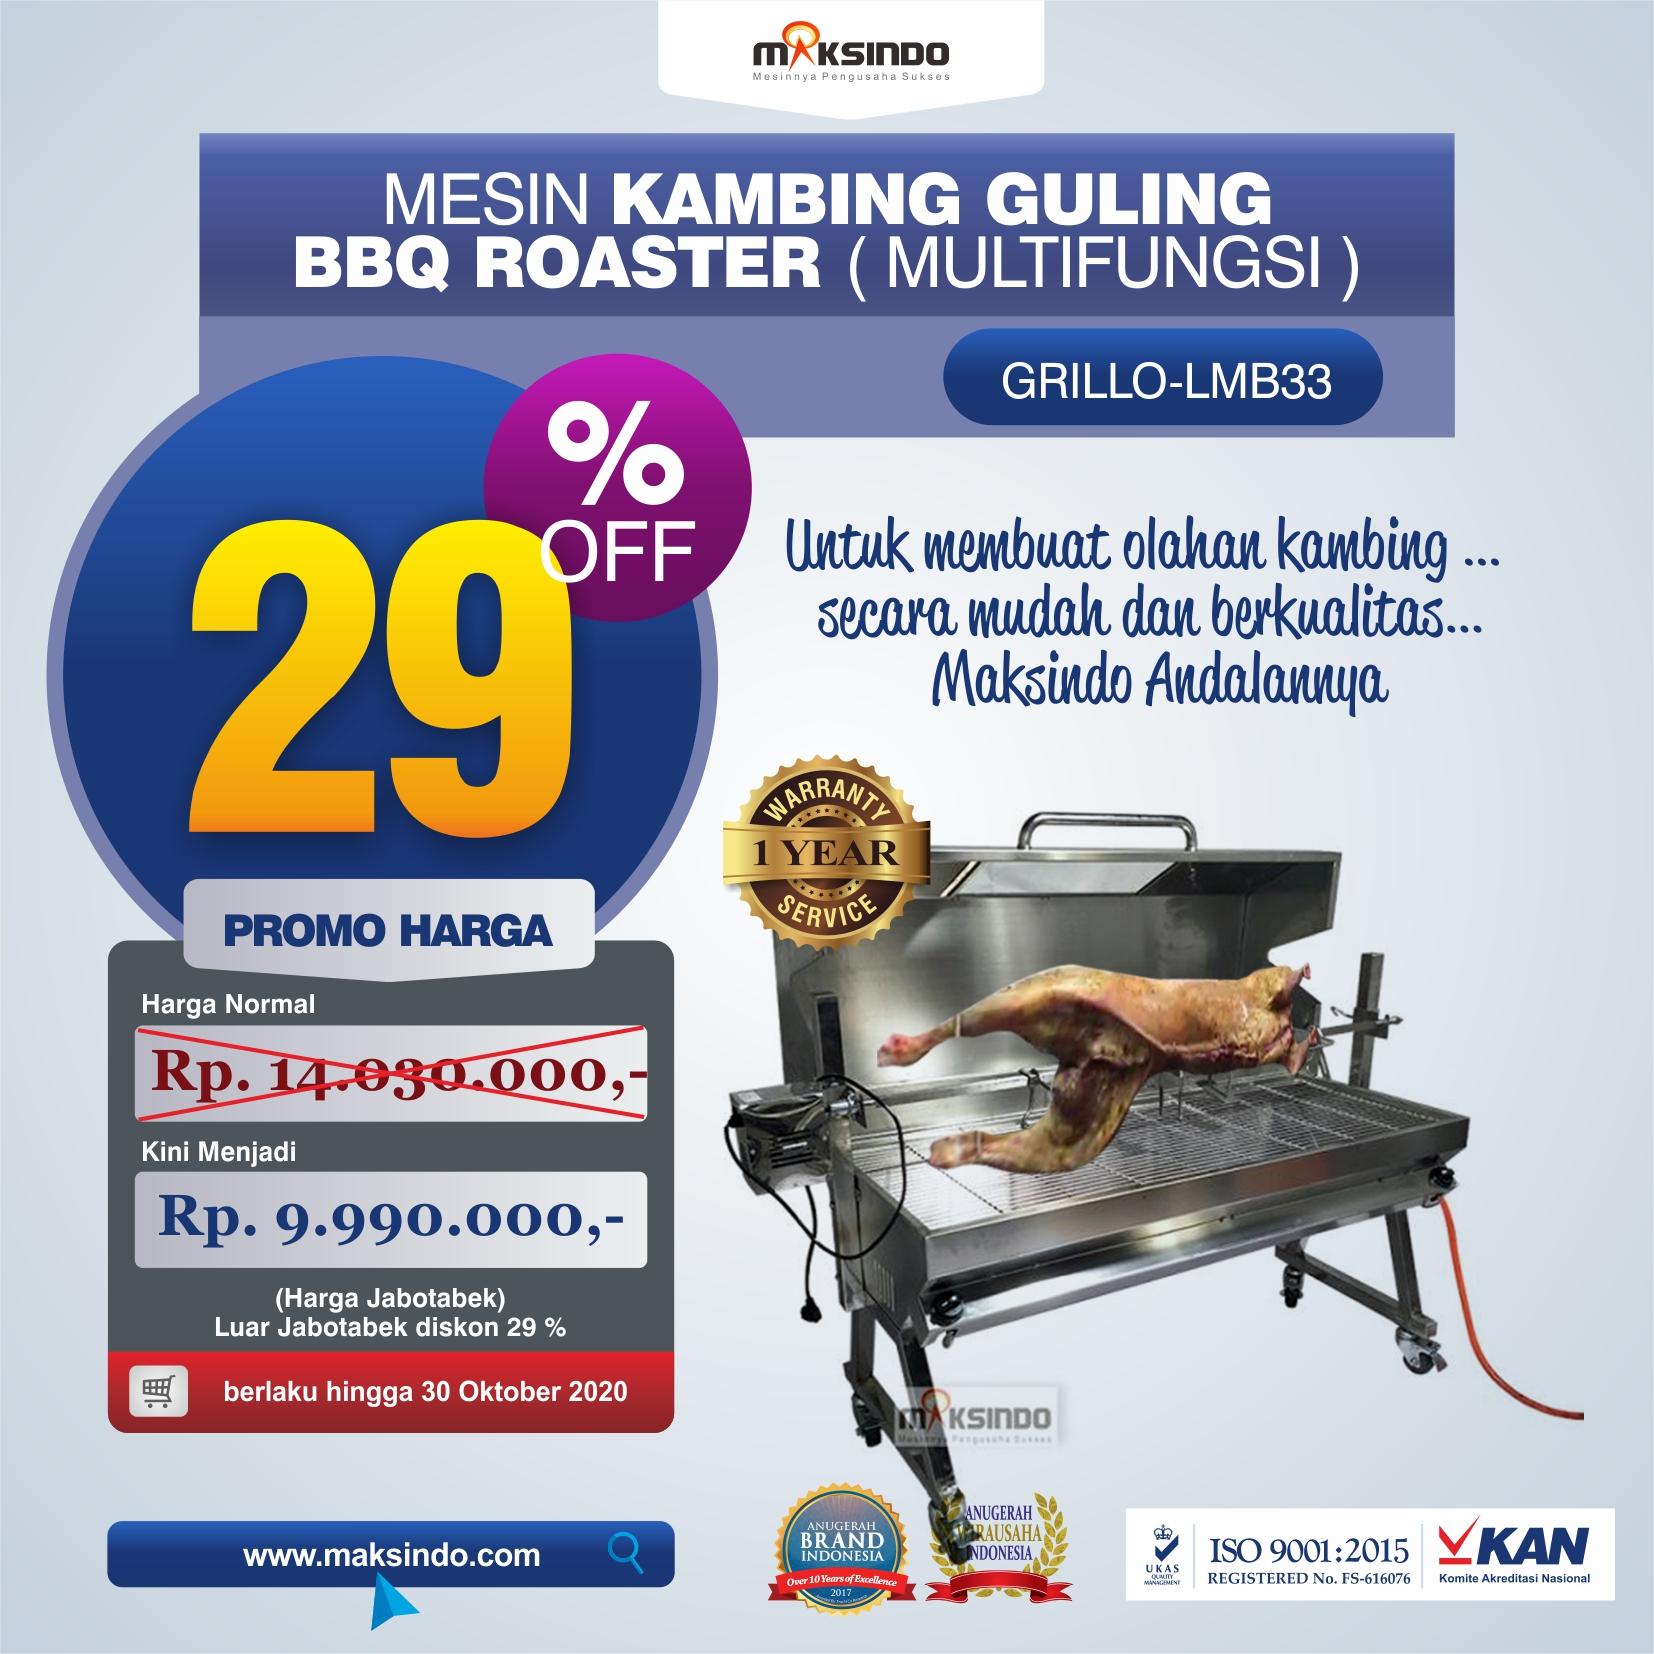 Jual Mesin Kambing Guling BBQ Roaster (GRILLO-LMB33) di Jakarta